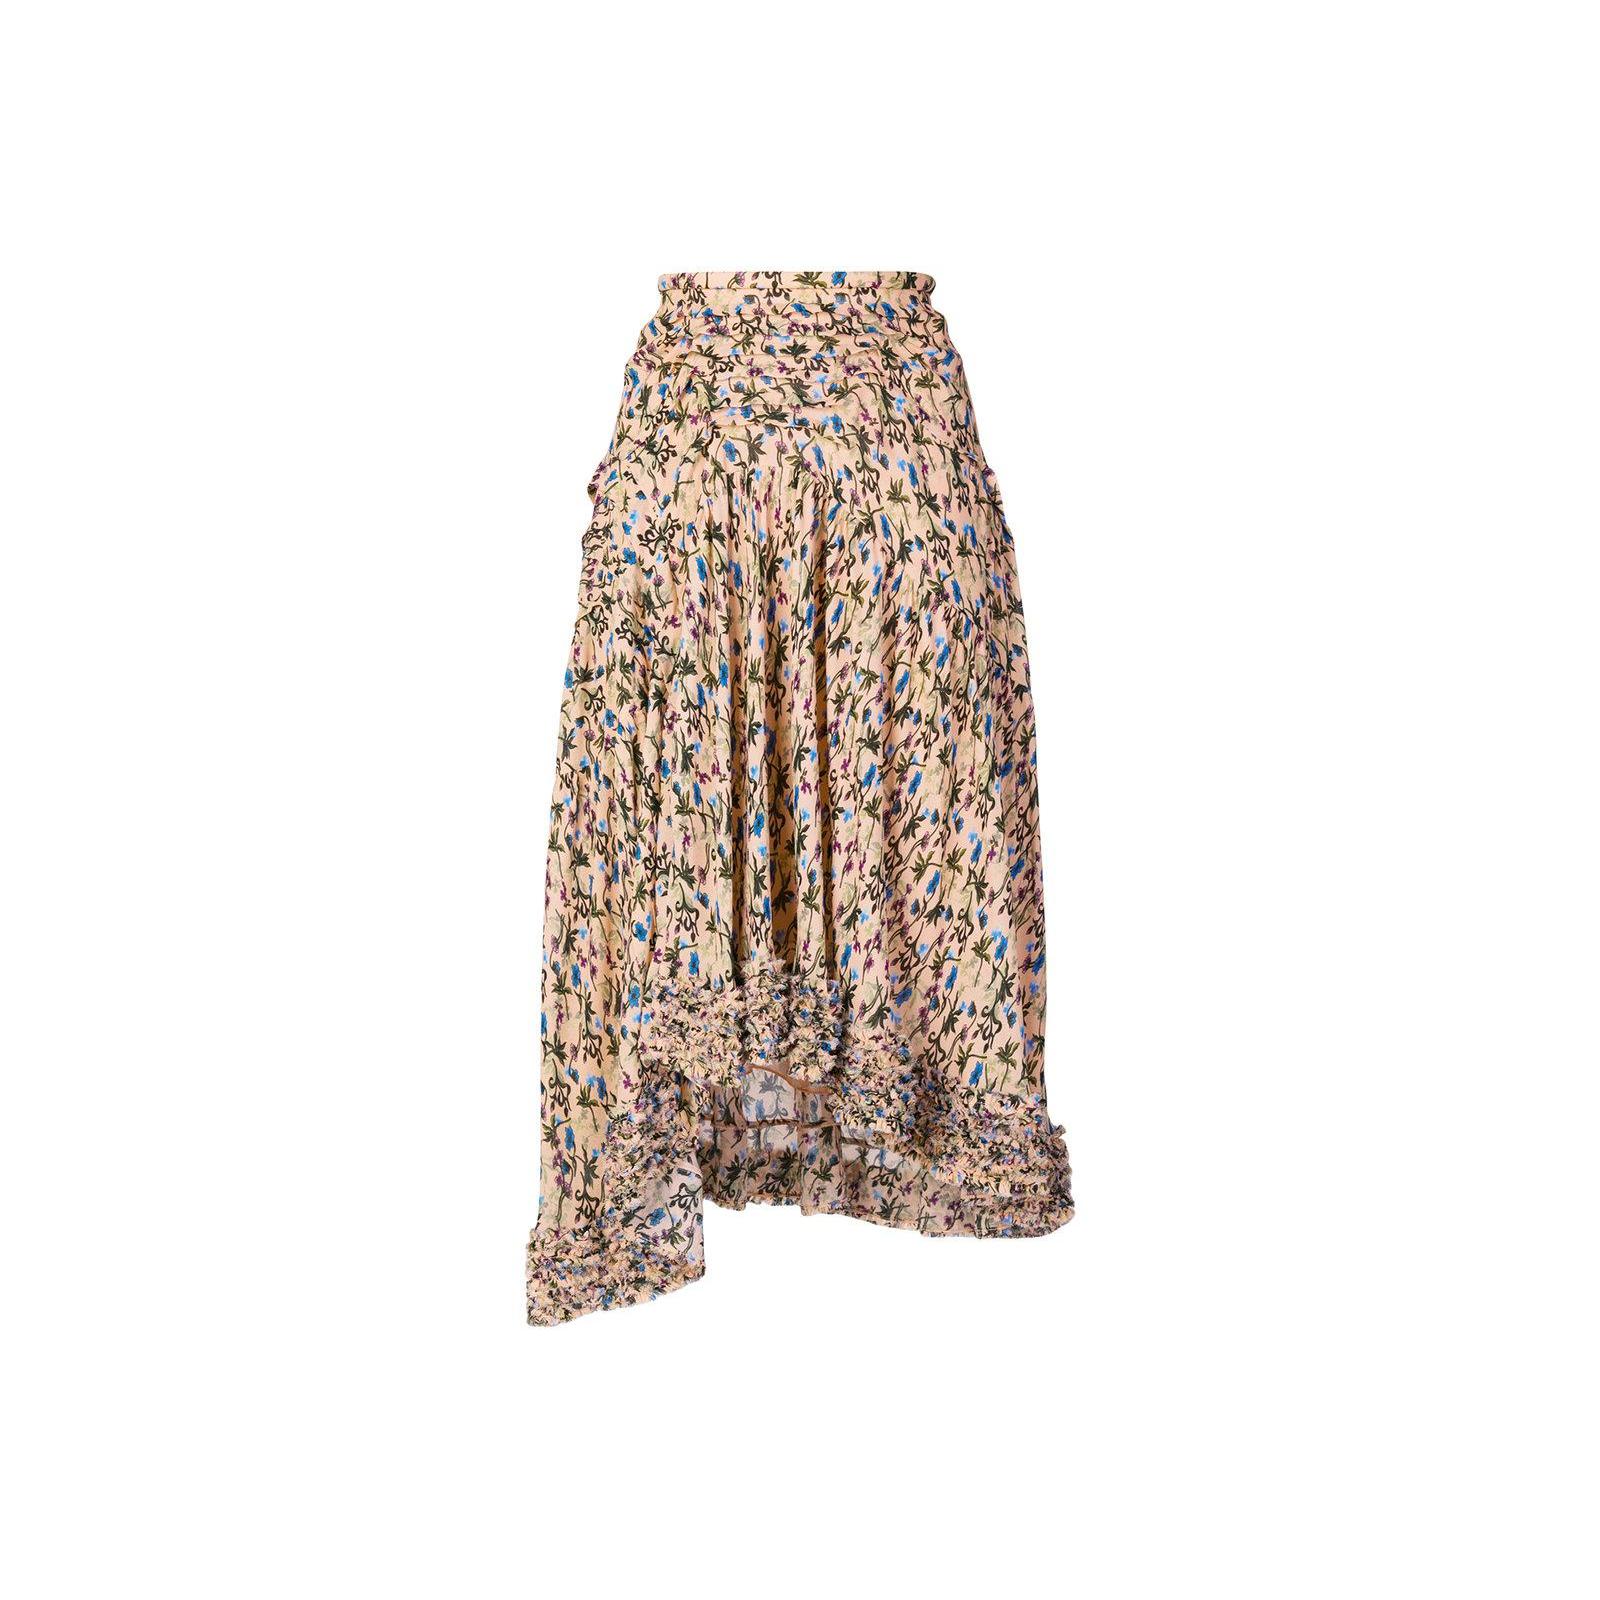 Chloe Natural Frayed Floral Skirt nowa